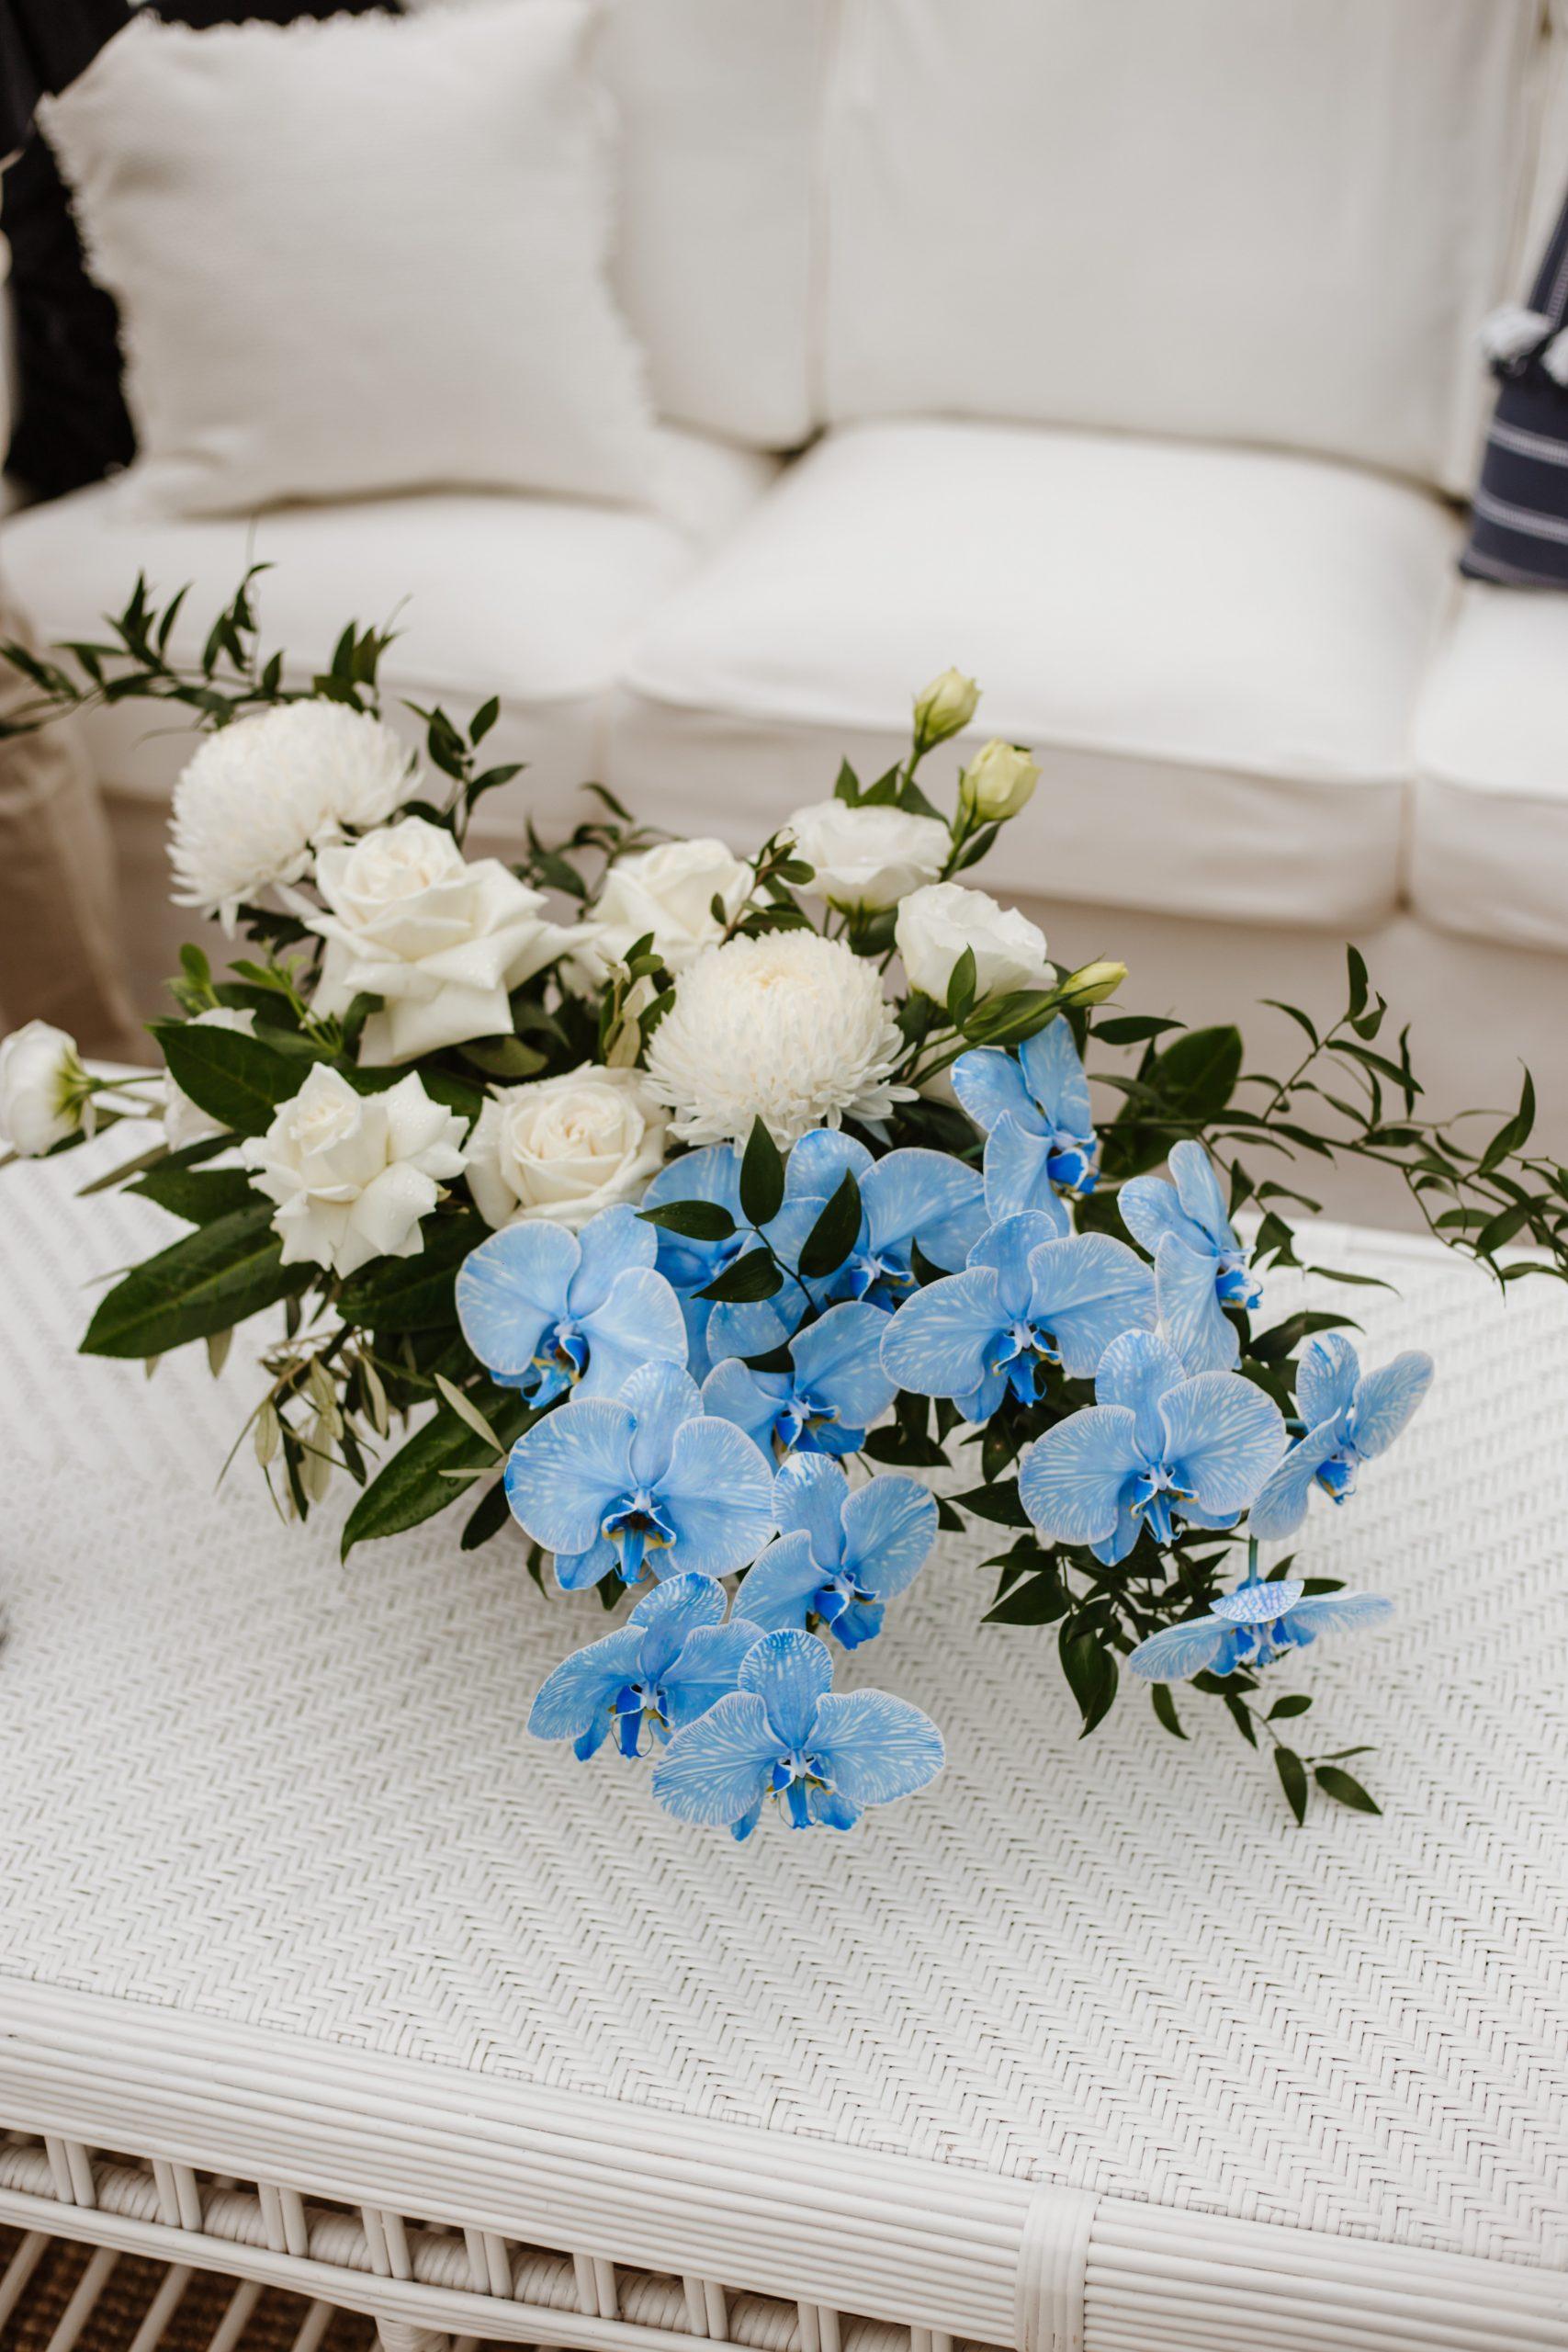 Blue Phalaenopsis Orchid Wedding